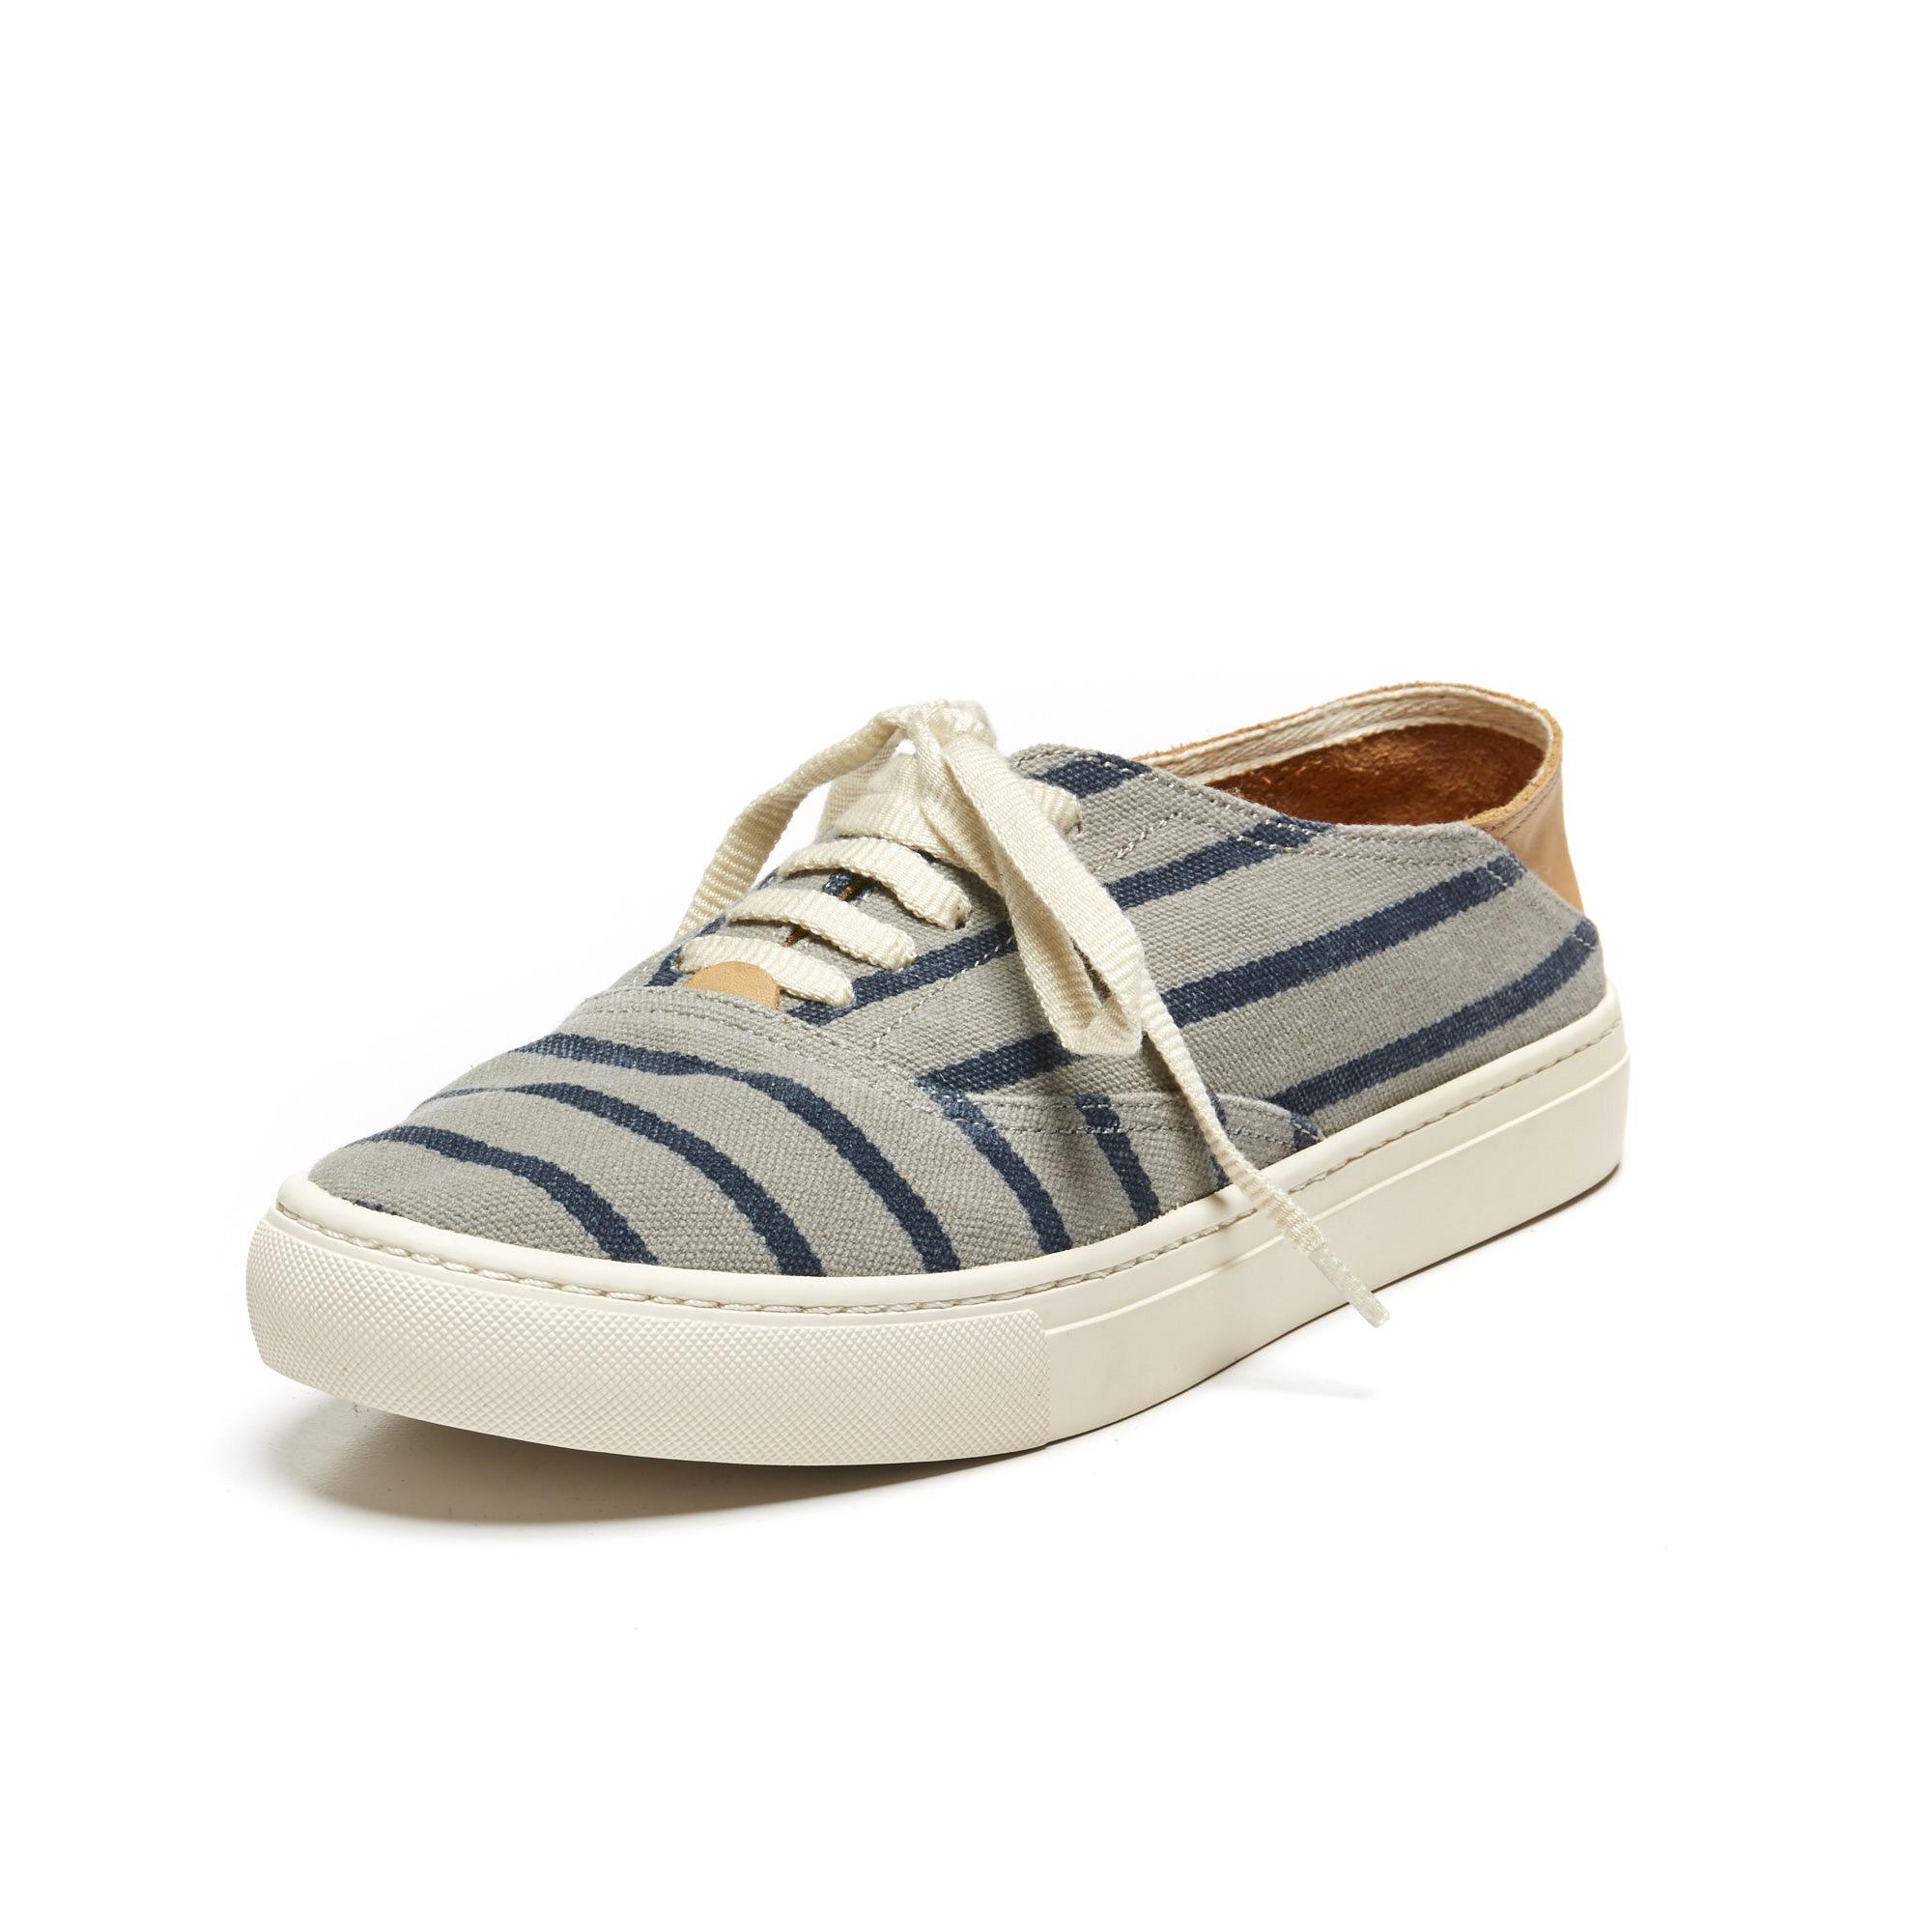 Convertible Soludos Sneaker Soludos Striped Striped Classic 3lFJ1KTc